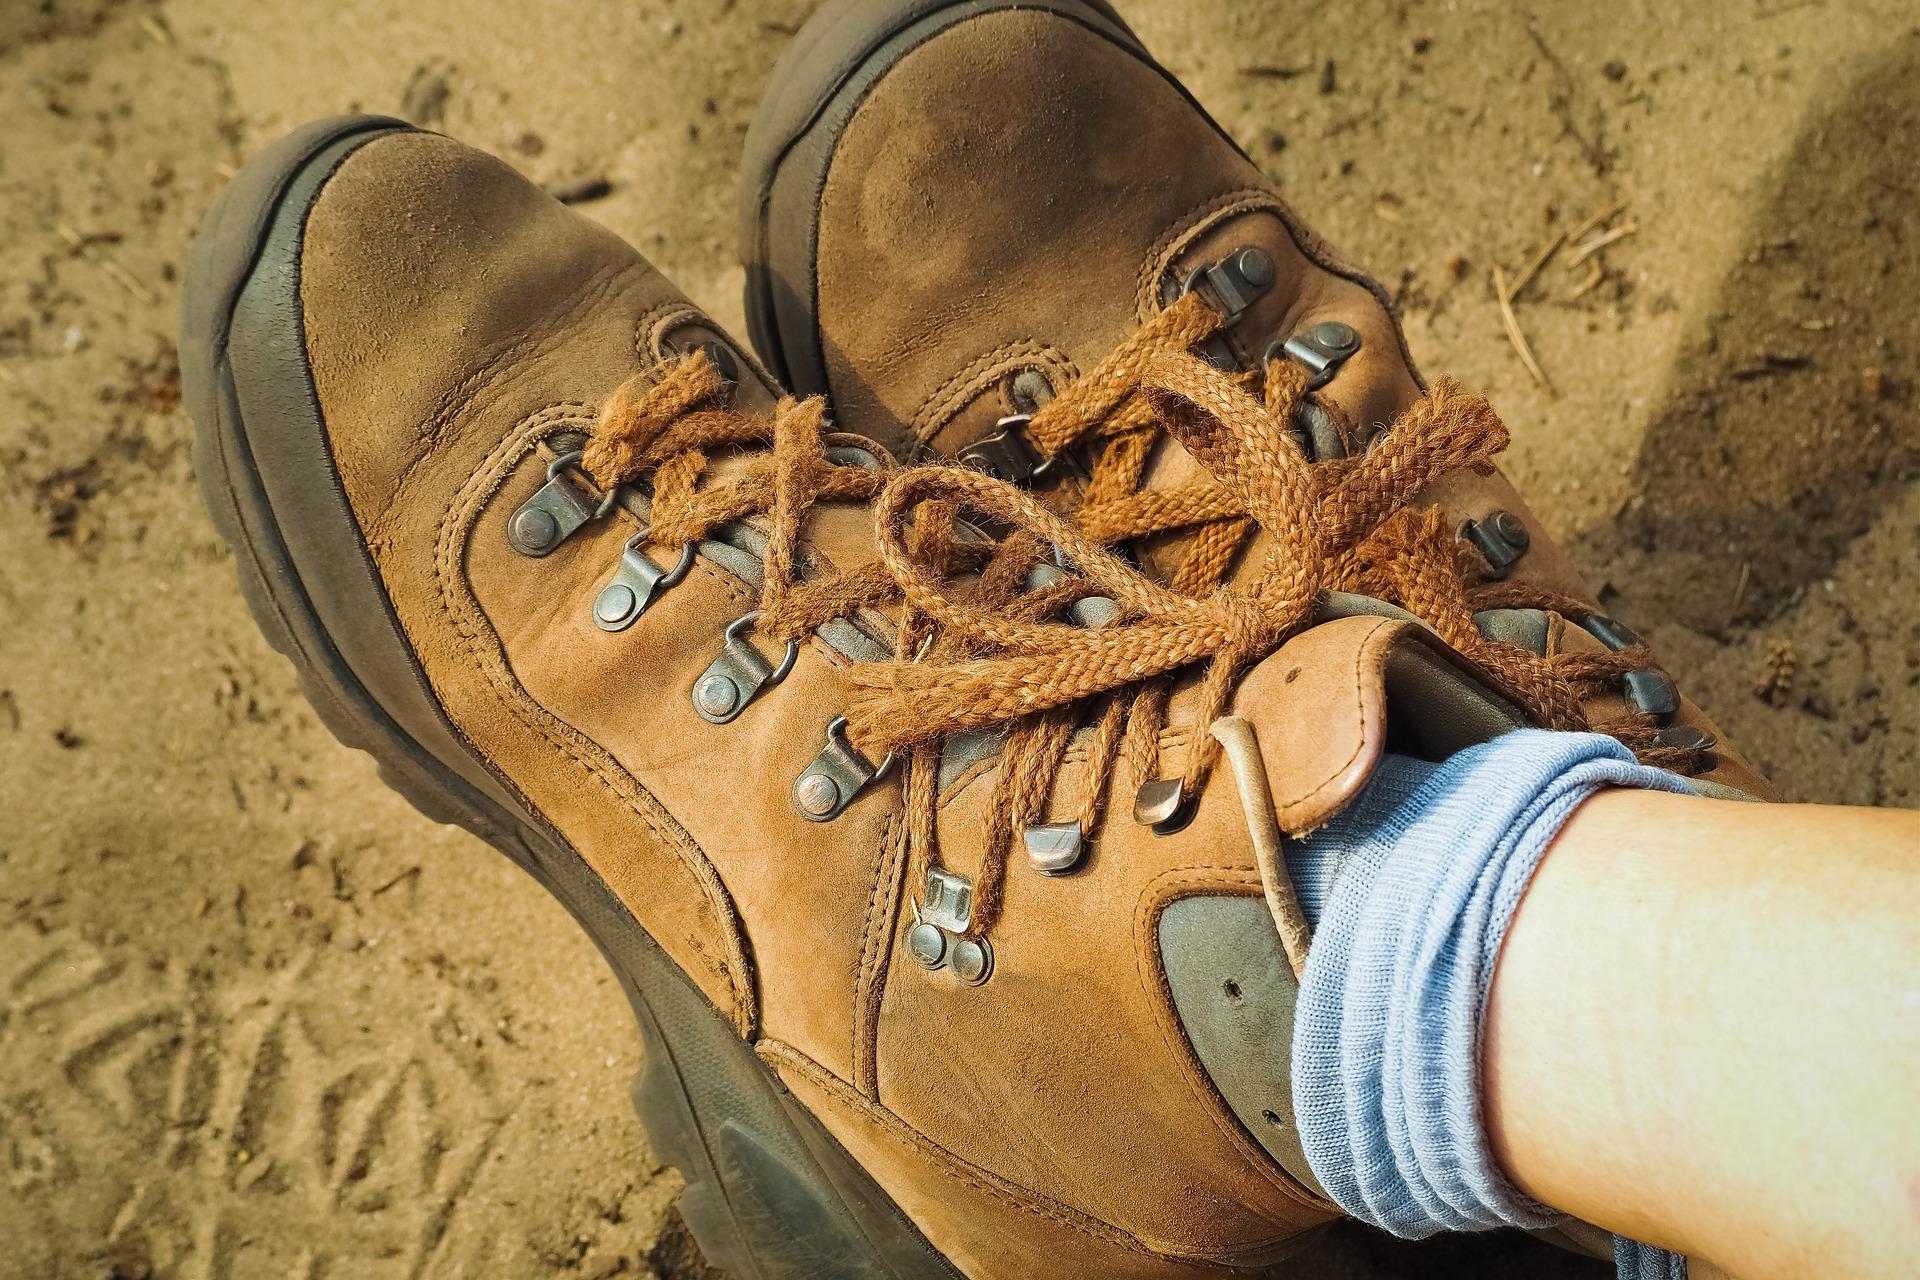 hiking boots socks pixabay